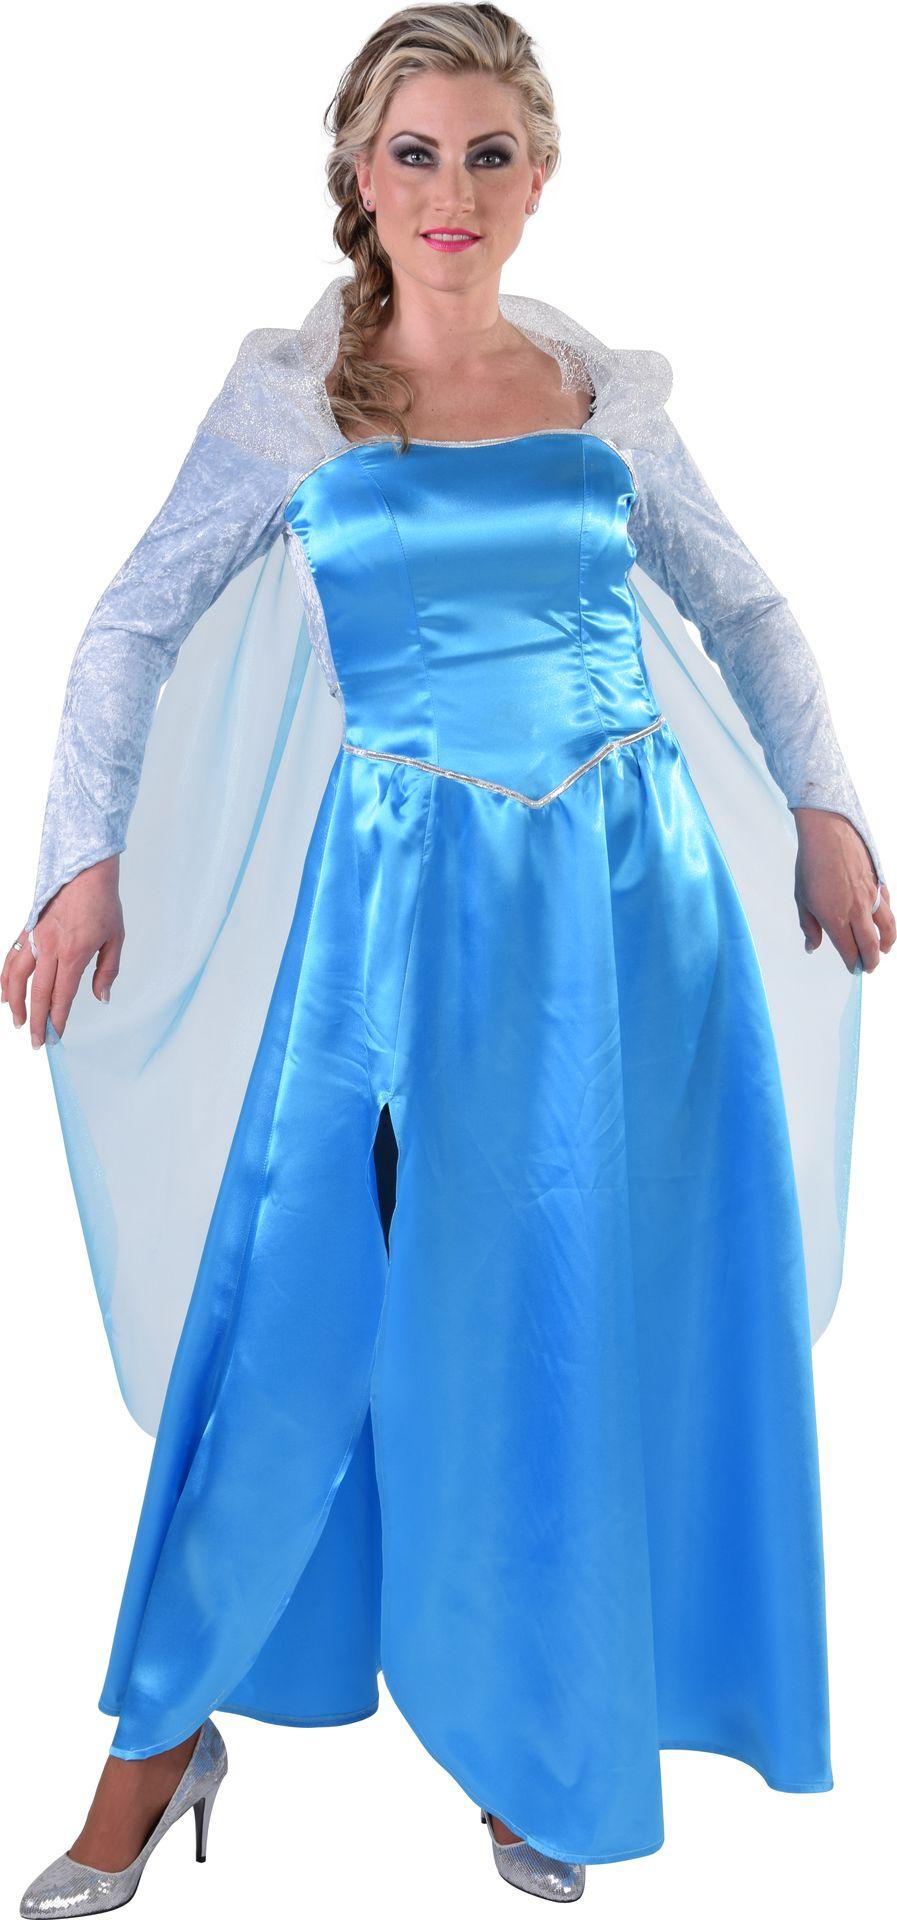 Elsa jurk Frozen vrouwen